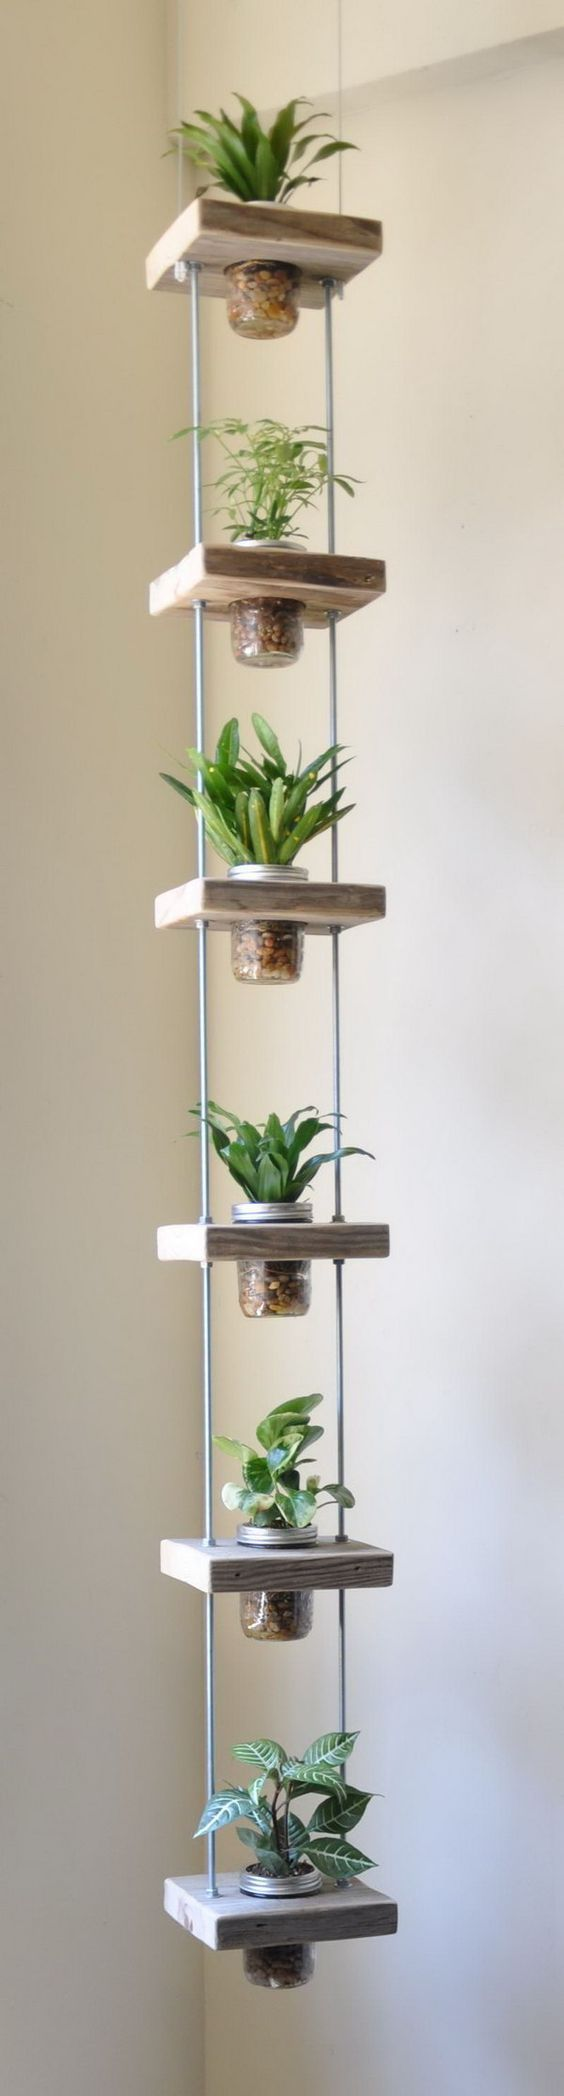 vertical herb garden from salvaged wood and mason jars, Cool DIY Indoor Herb Garden Ideas, http://hative.com/cool-diy-indoor-herb-garden-ideas/,: